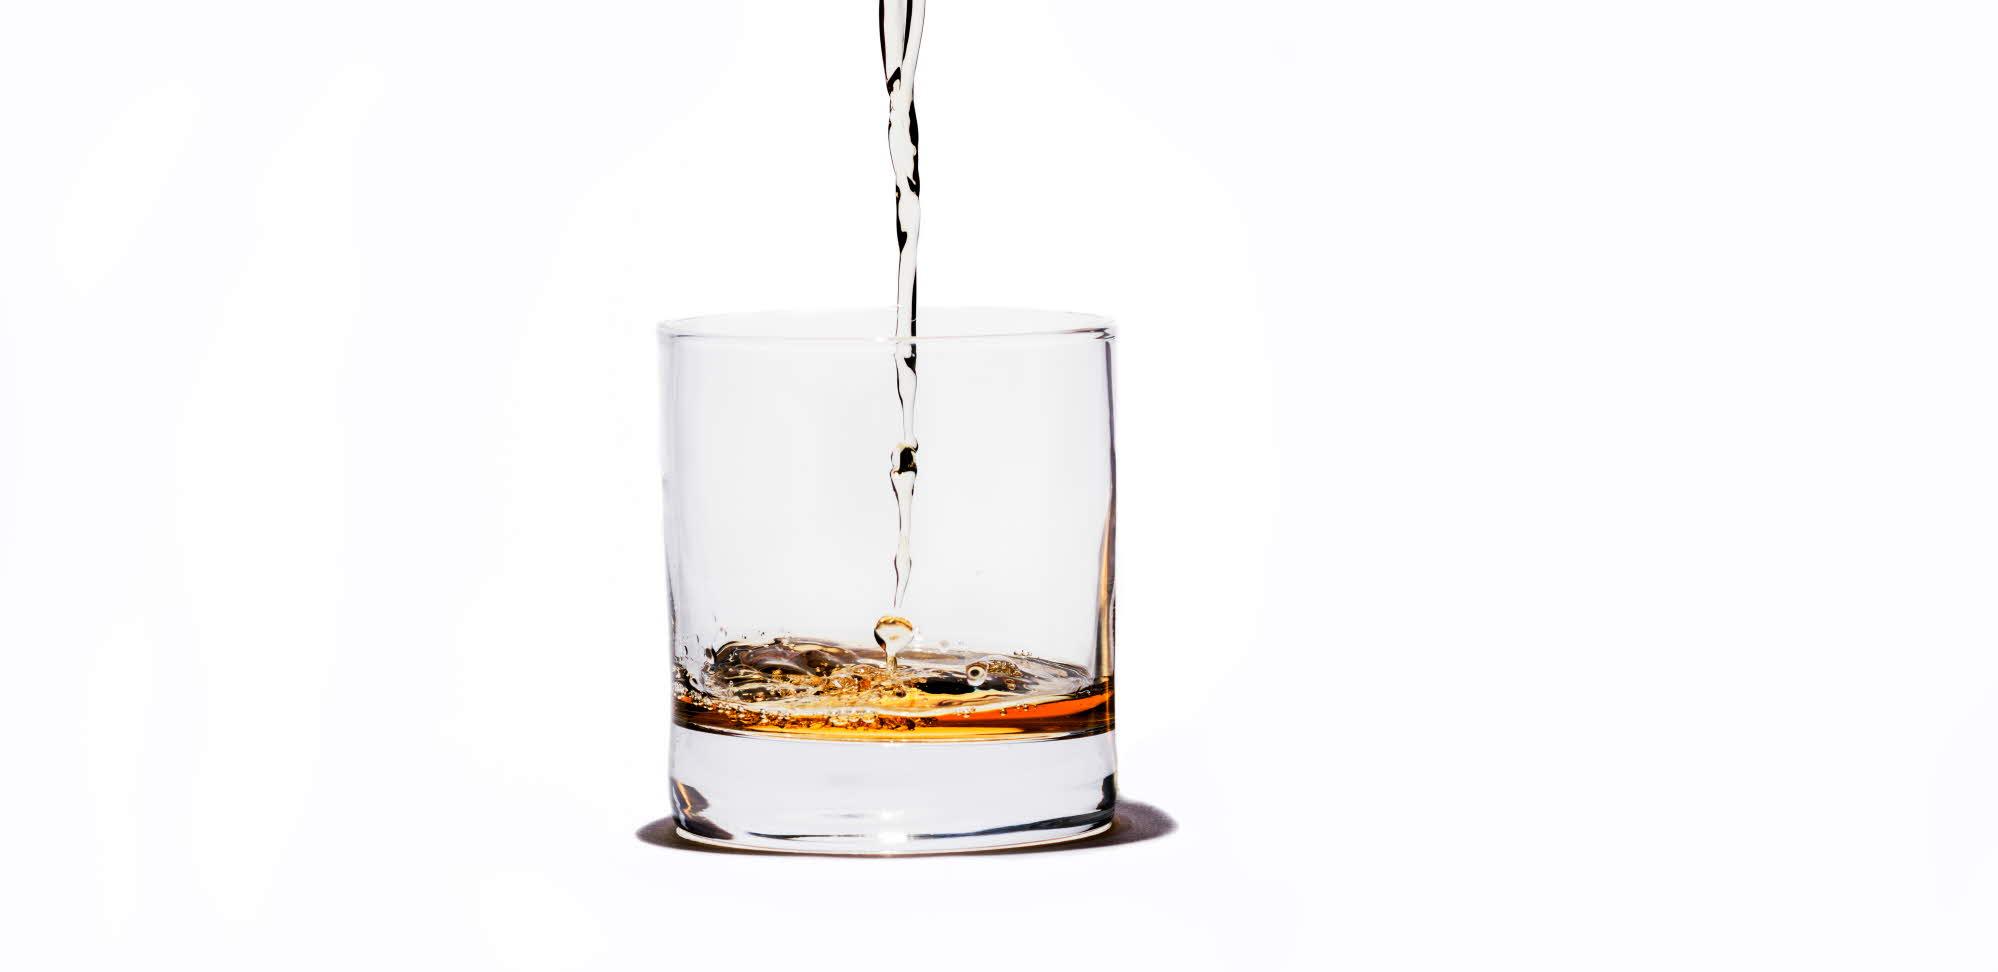 https://lnu.se/mot-linneuniversitetet/aktuellt/nyheter/2017/darfor-smakar-whiskyn-battre-om-den-spads-med-vatten/